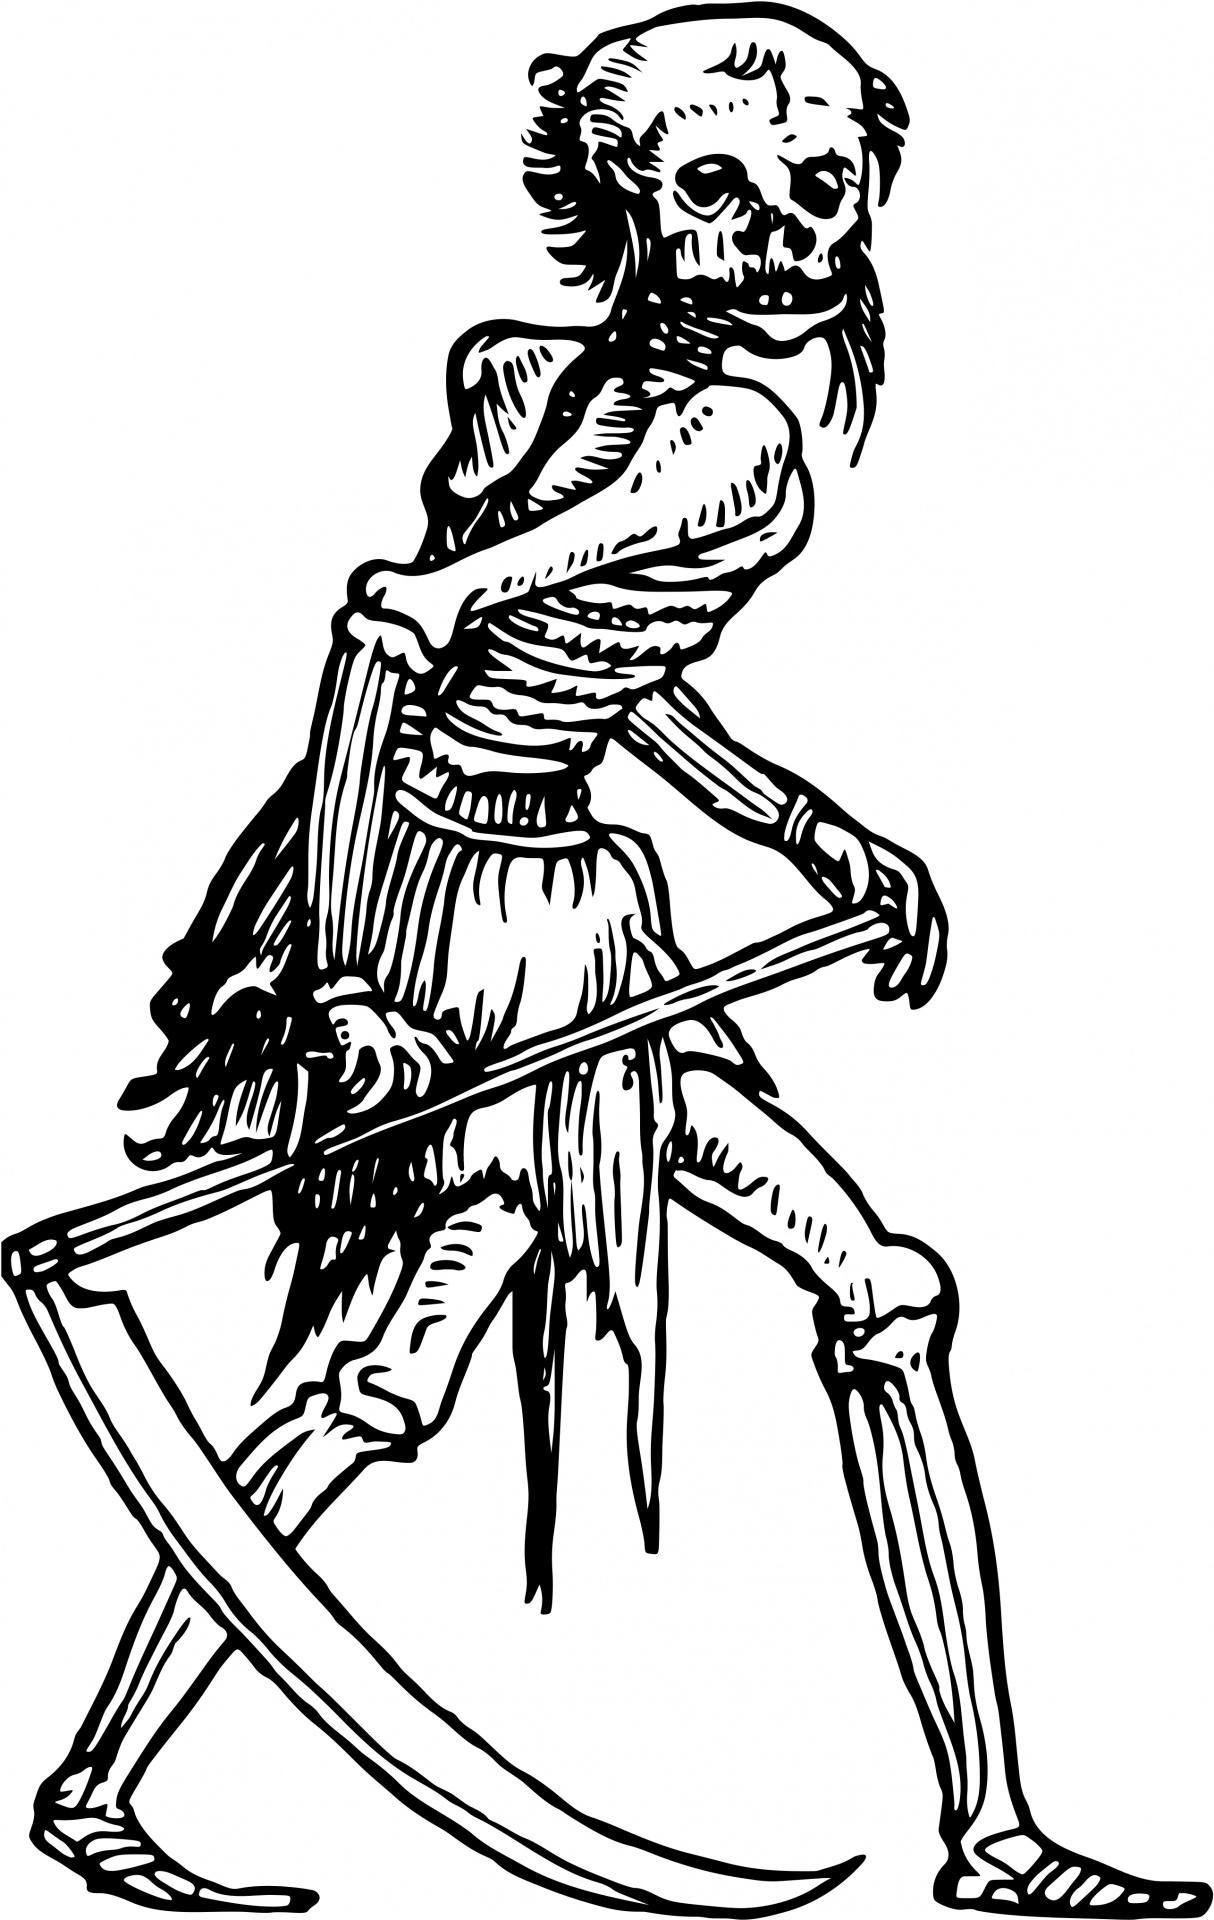 Grim Reaper Free Stock Photo